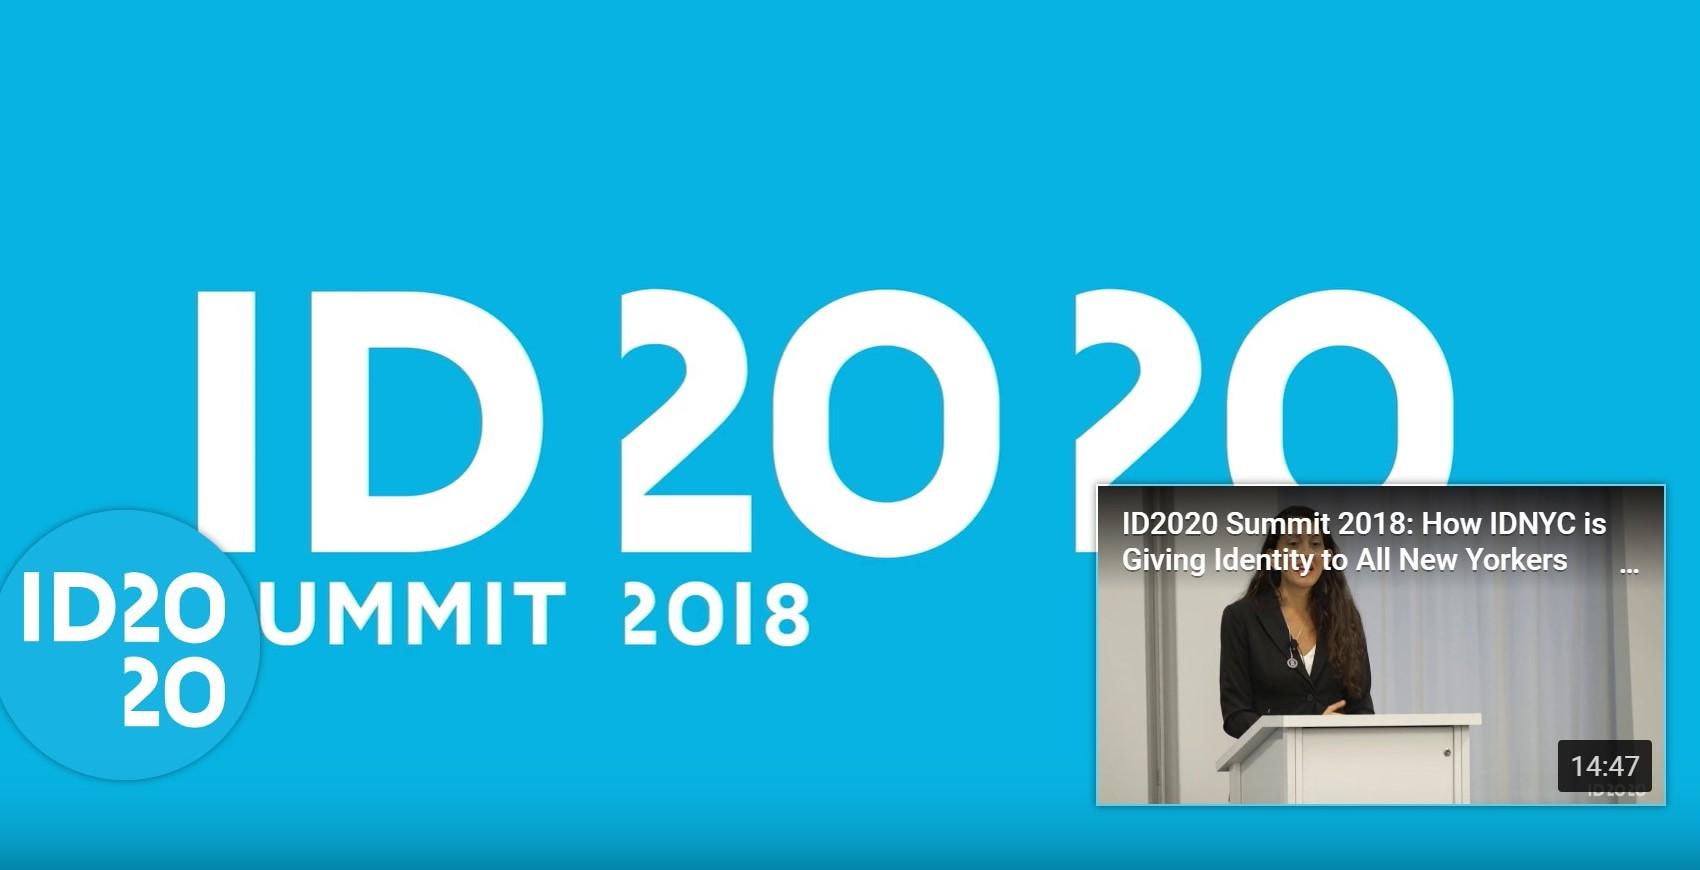 Our Manifesto | ID2020